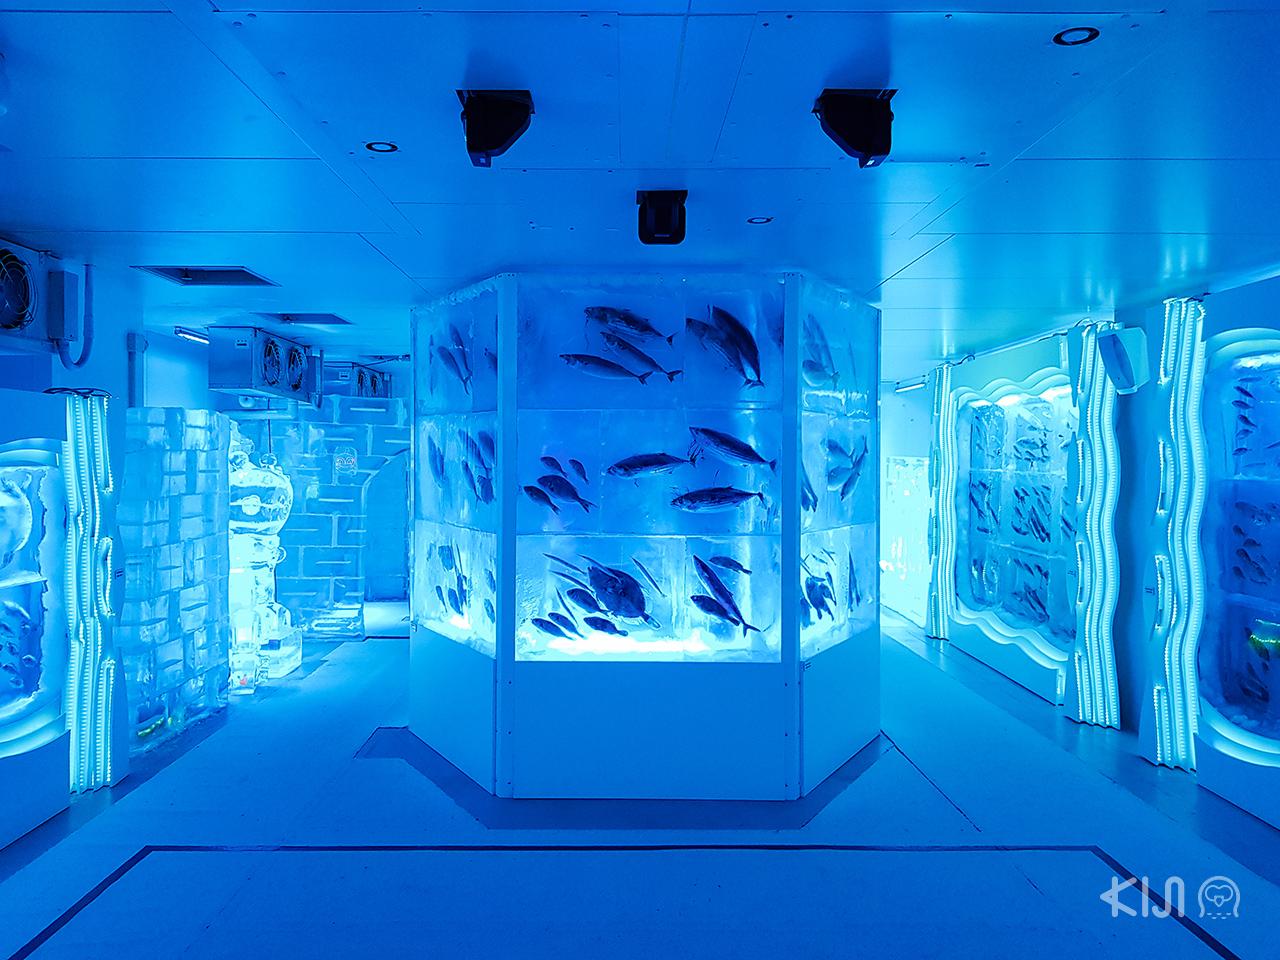 Ice Aquarium เมืองเคเซ็นนุมะ (Kesennuma) จ.มิยากิ